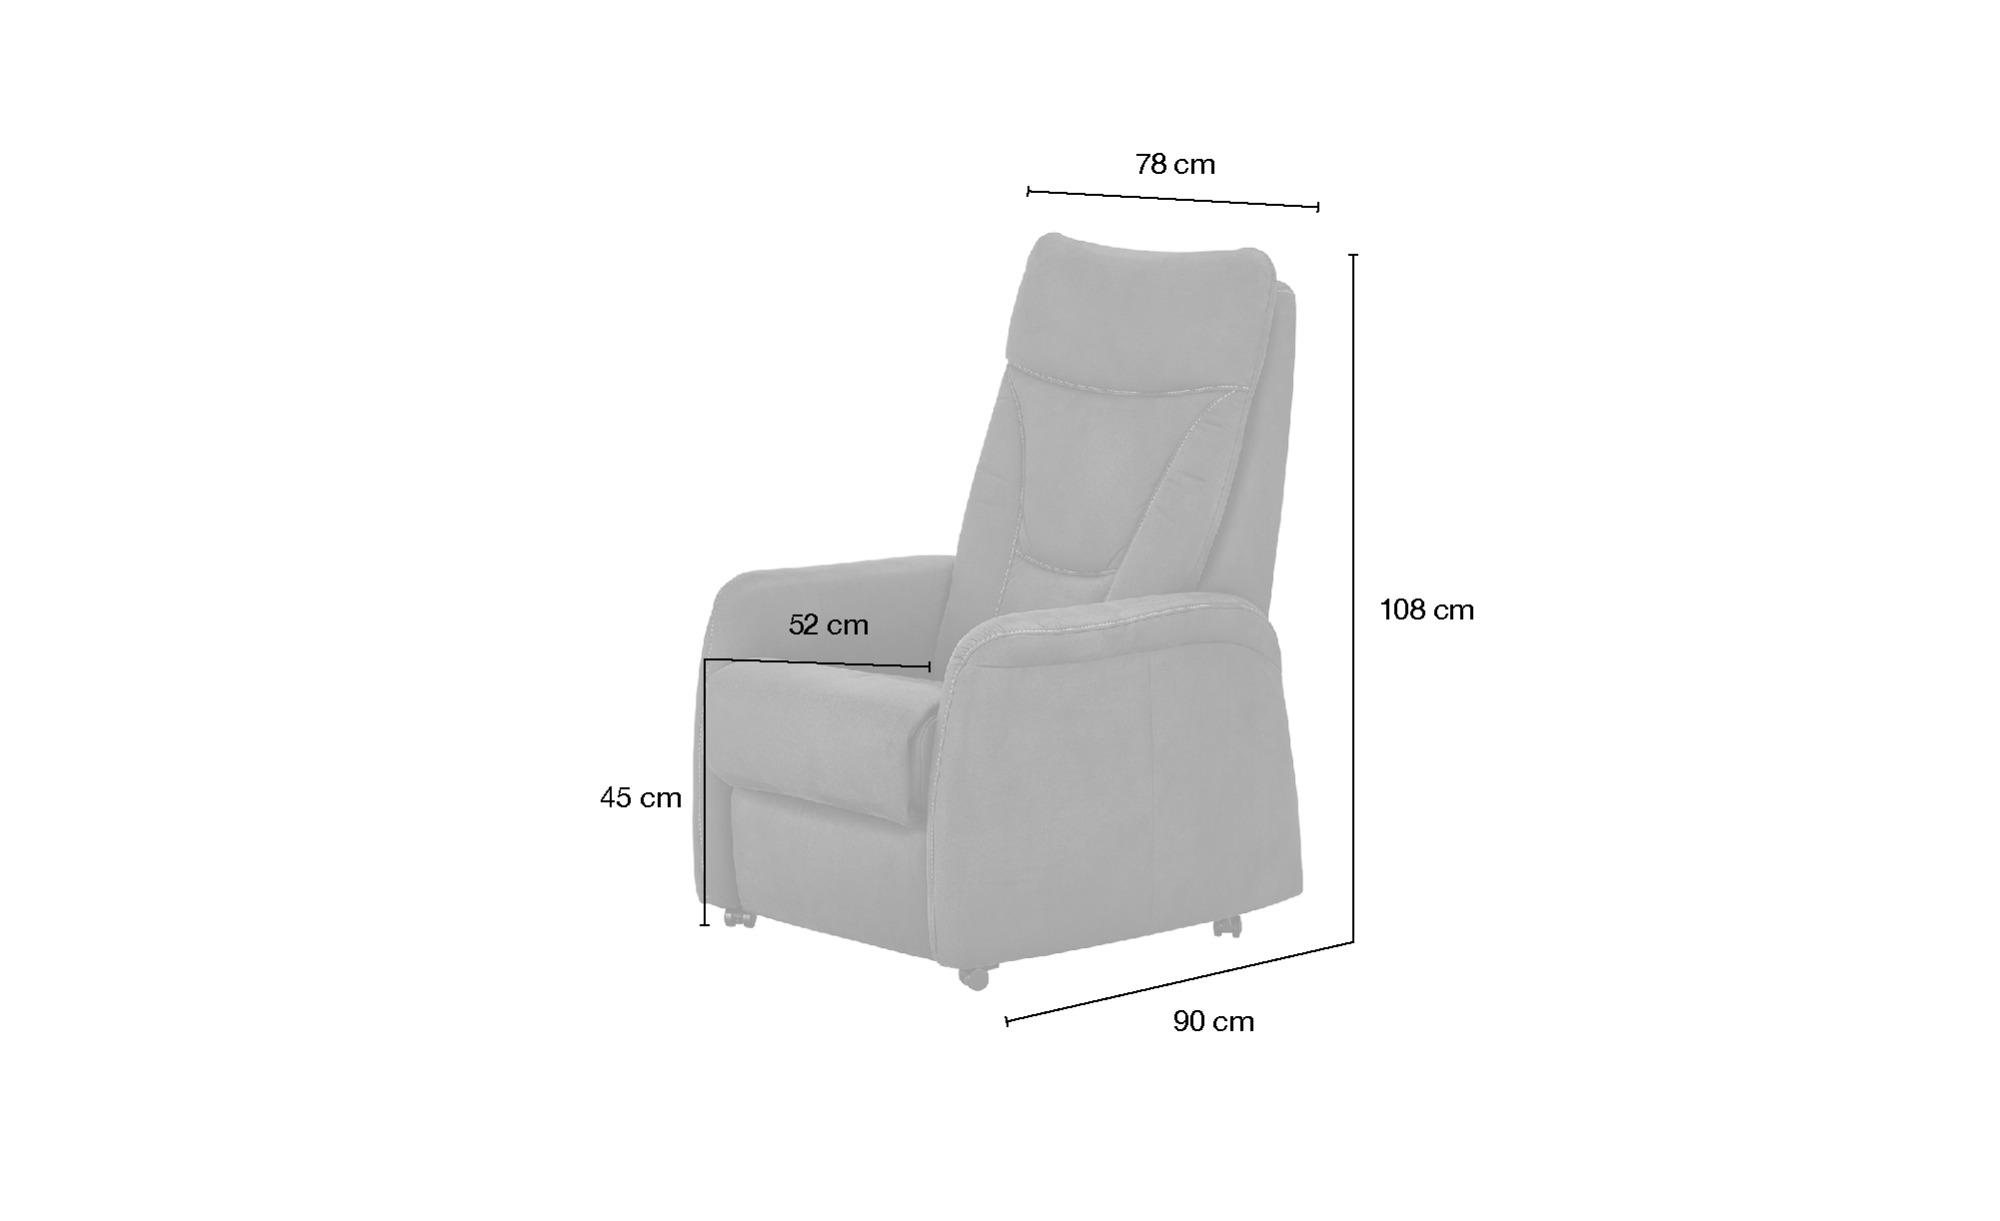 Hukla Fernsehsessel - creme - 78 cm - 108 cm - 90 cm - Polstermöbel > Sessel > Fernsehsessel - Möbel Kraft | Wohnzimmer > Sessel > Fernsehsessel | Hukla